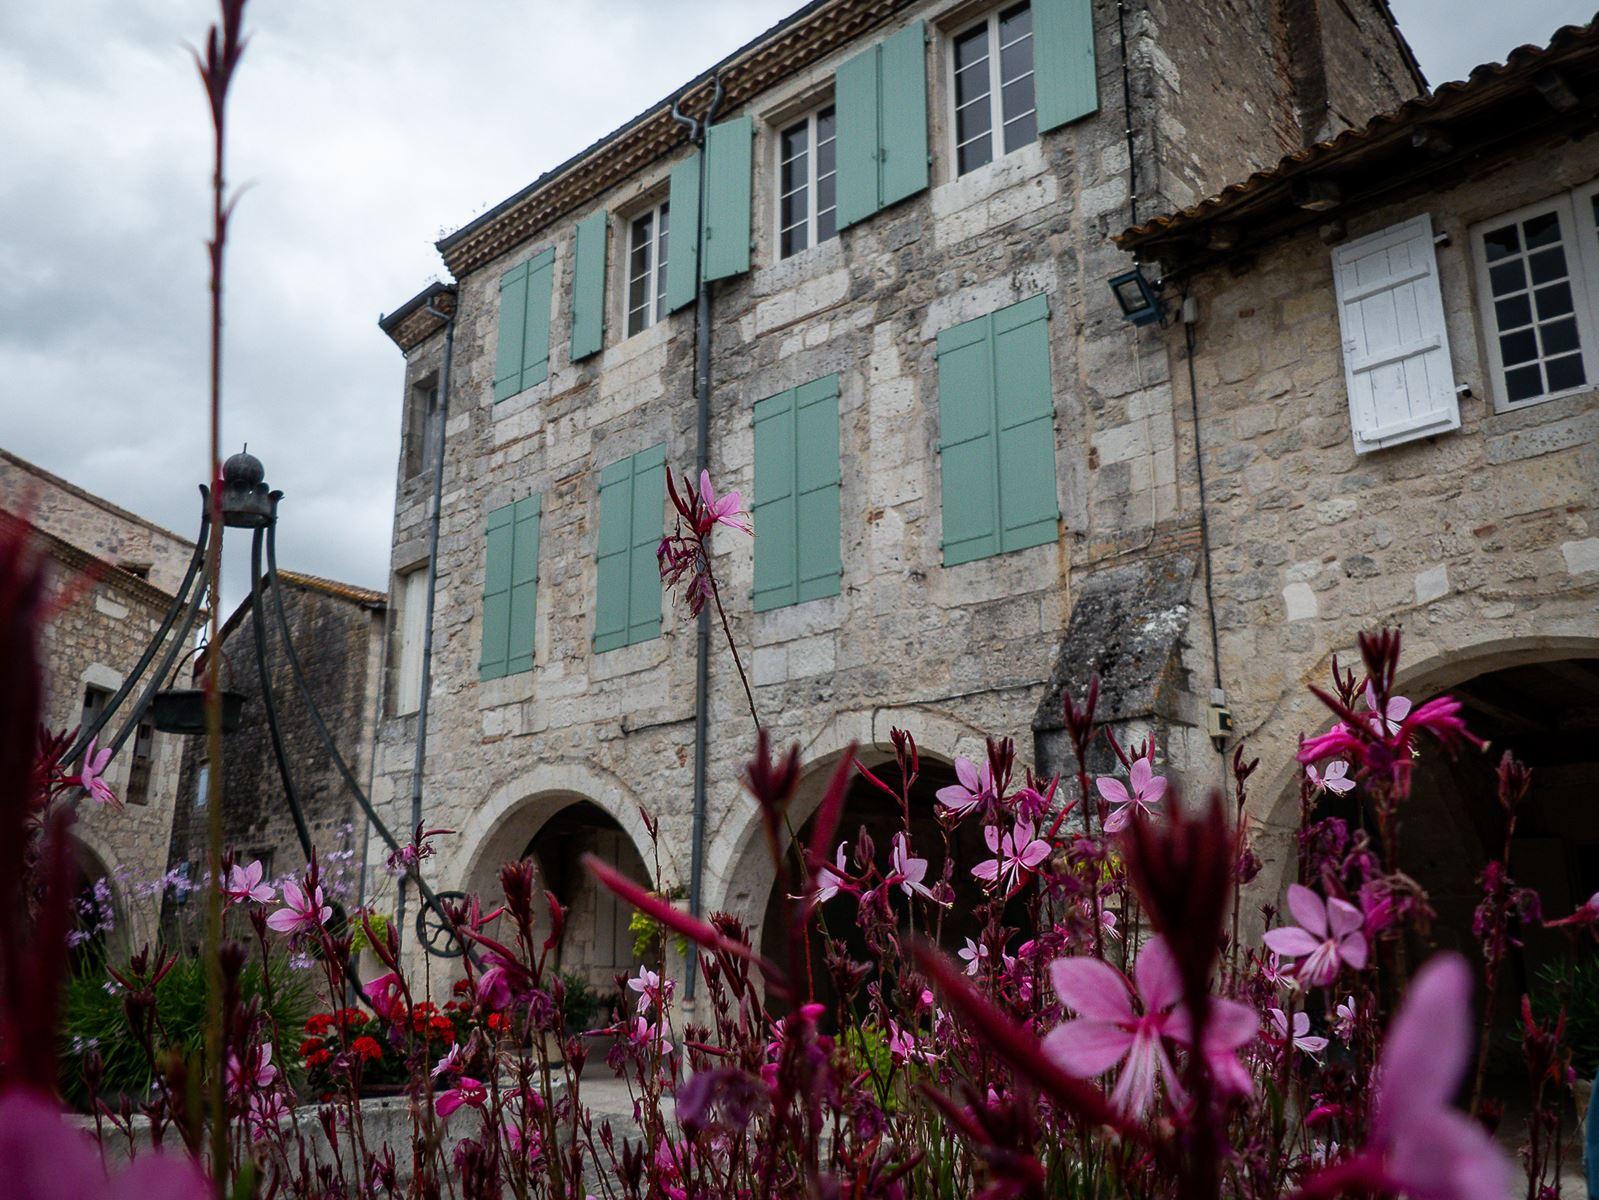 Bastide de Castelsagrat